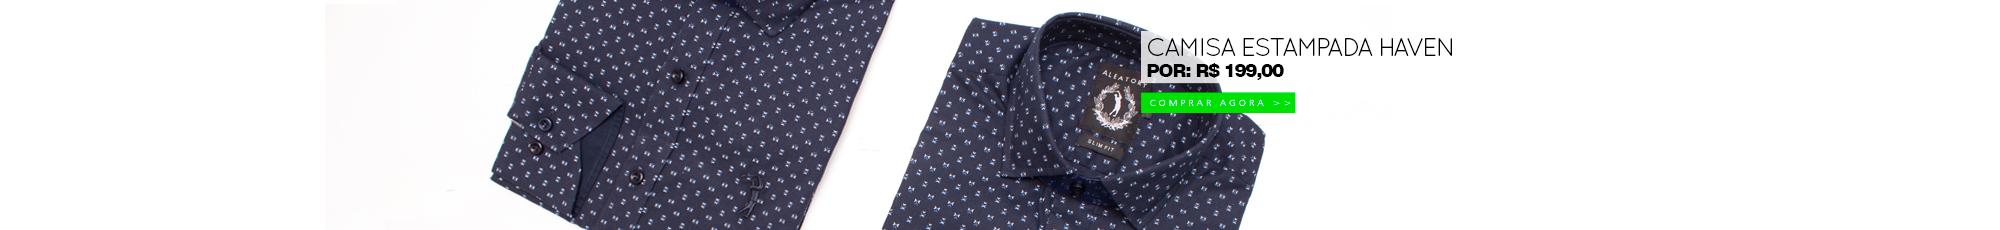 camisa_masculina_3